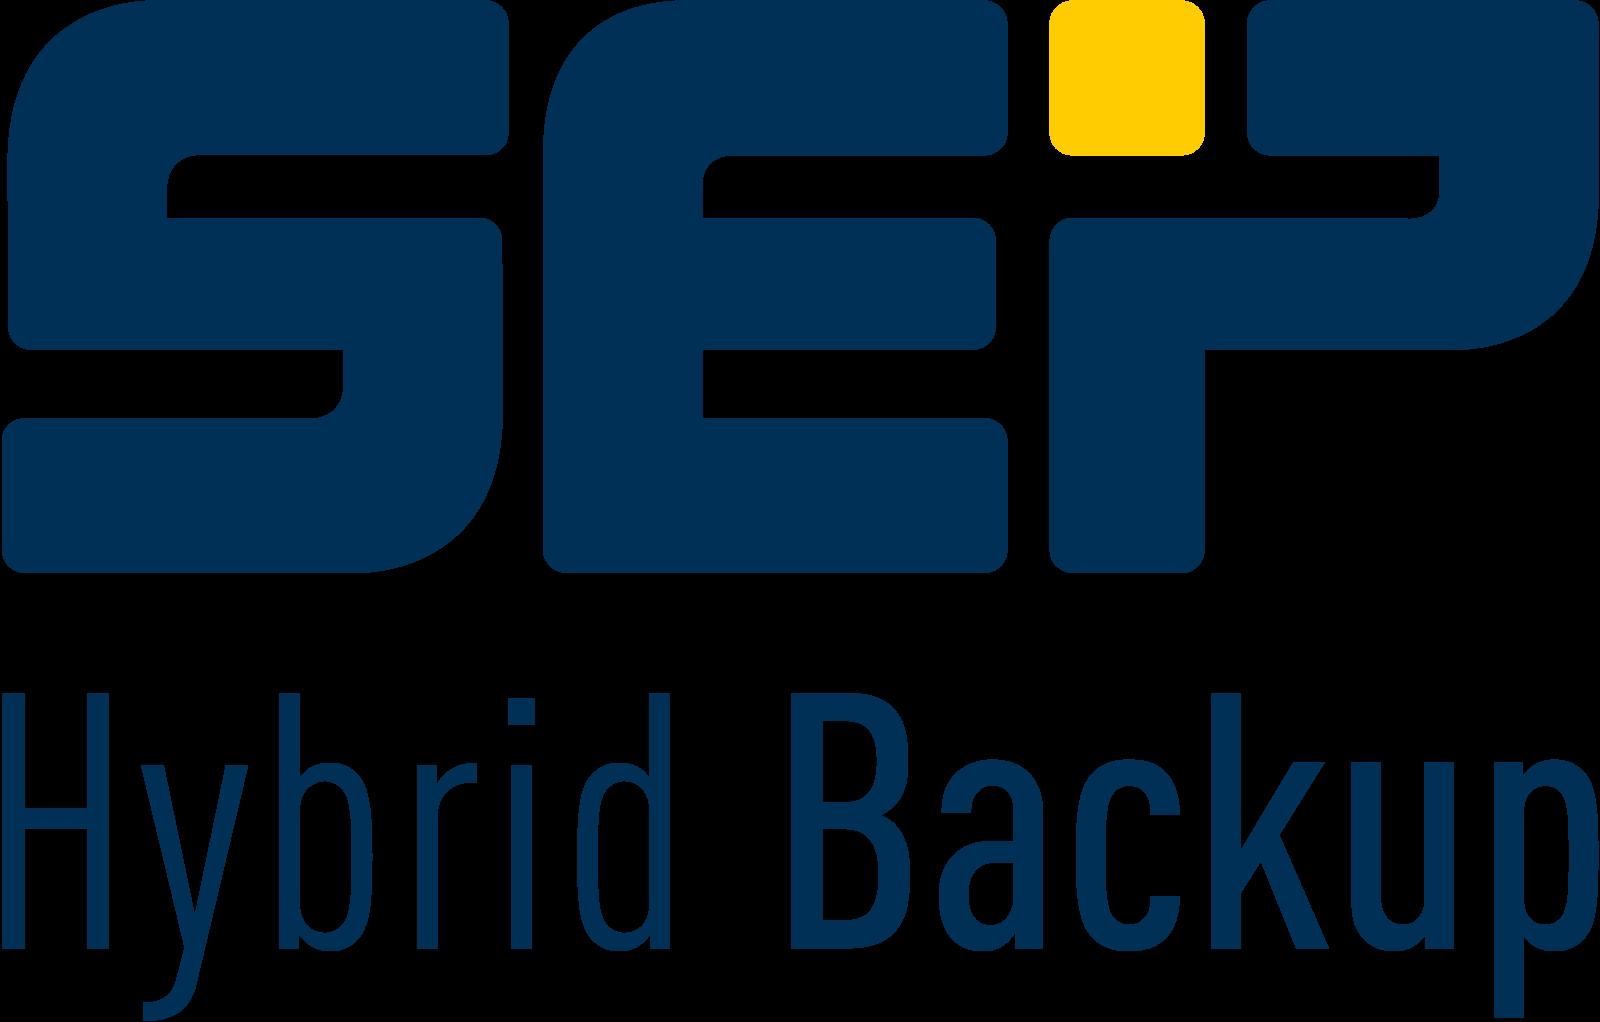 SEP HybridBackup-sub cmyk